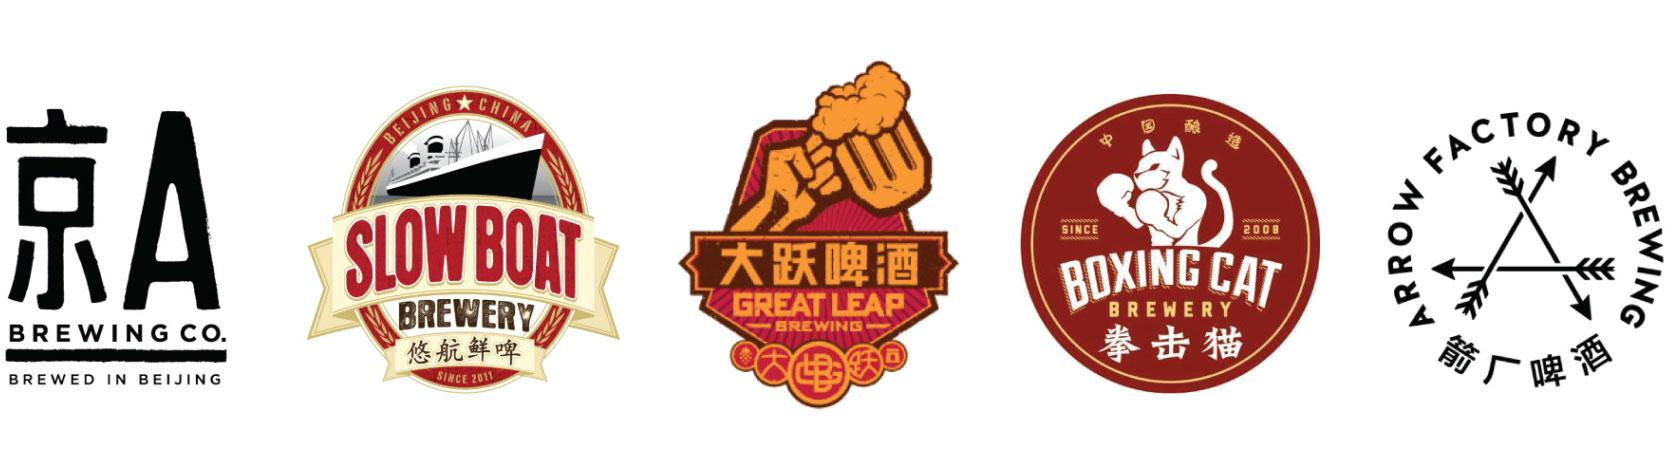 Chinese brewery logos